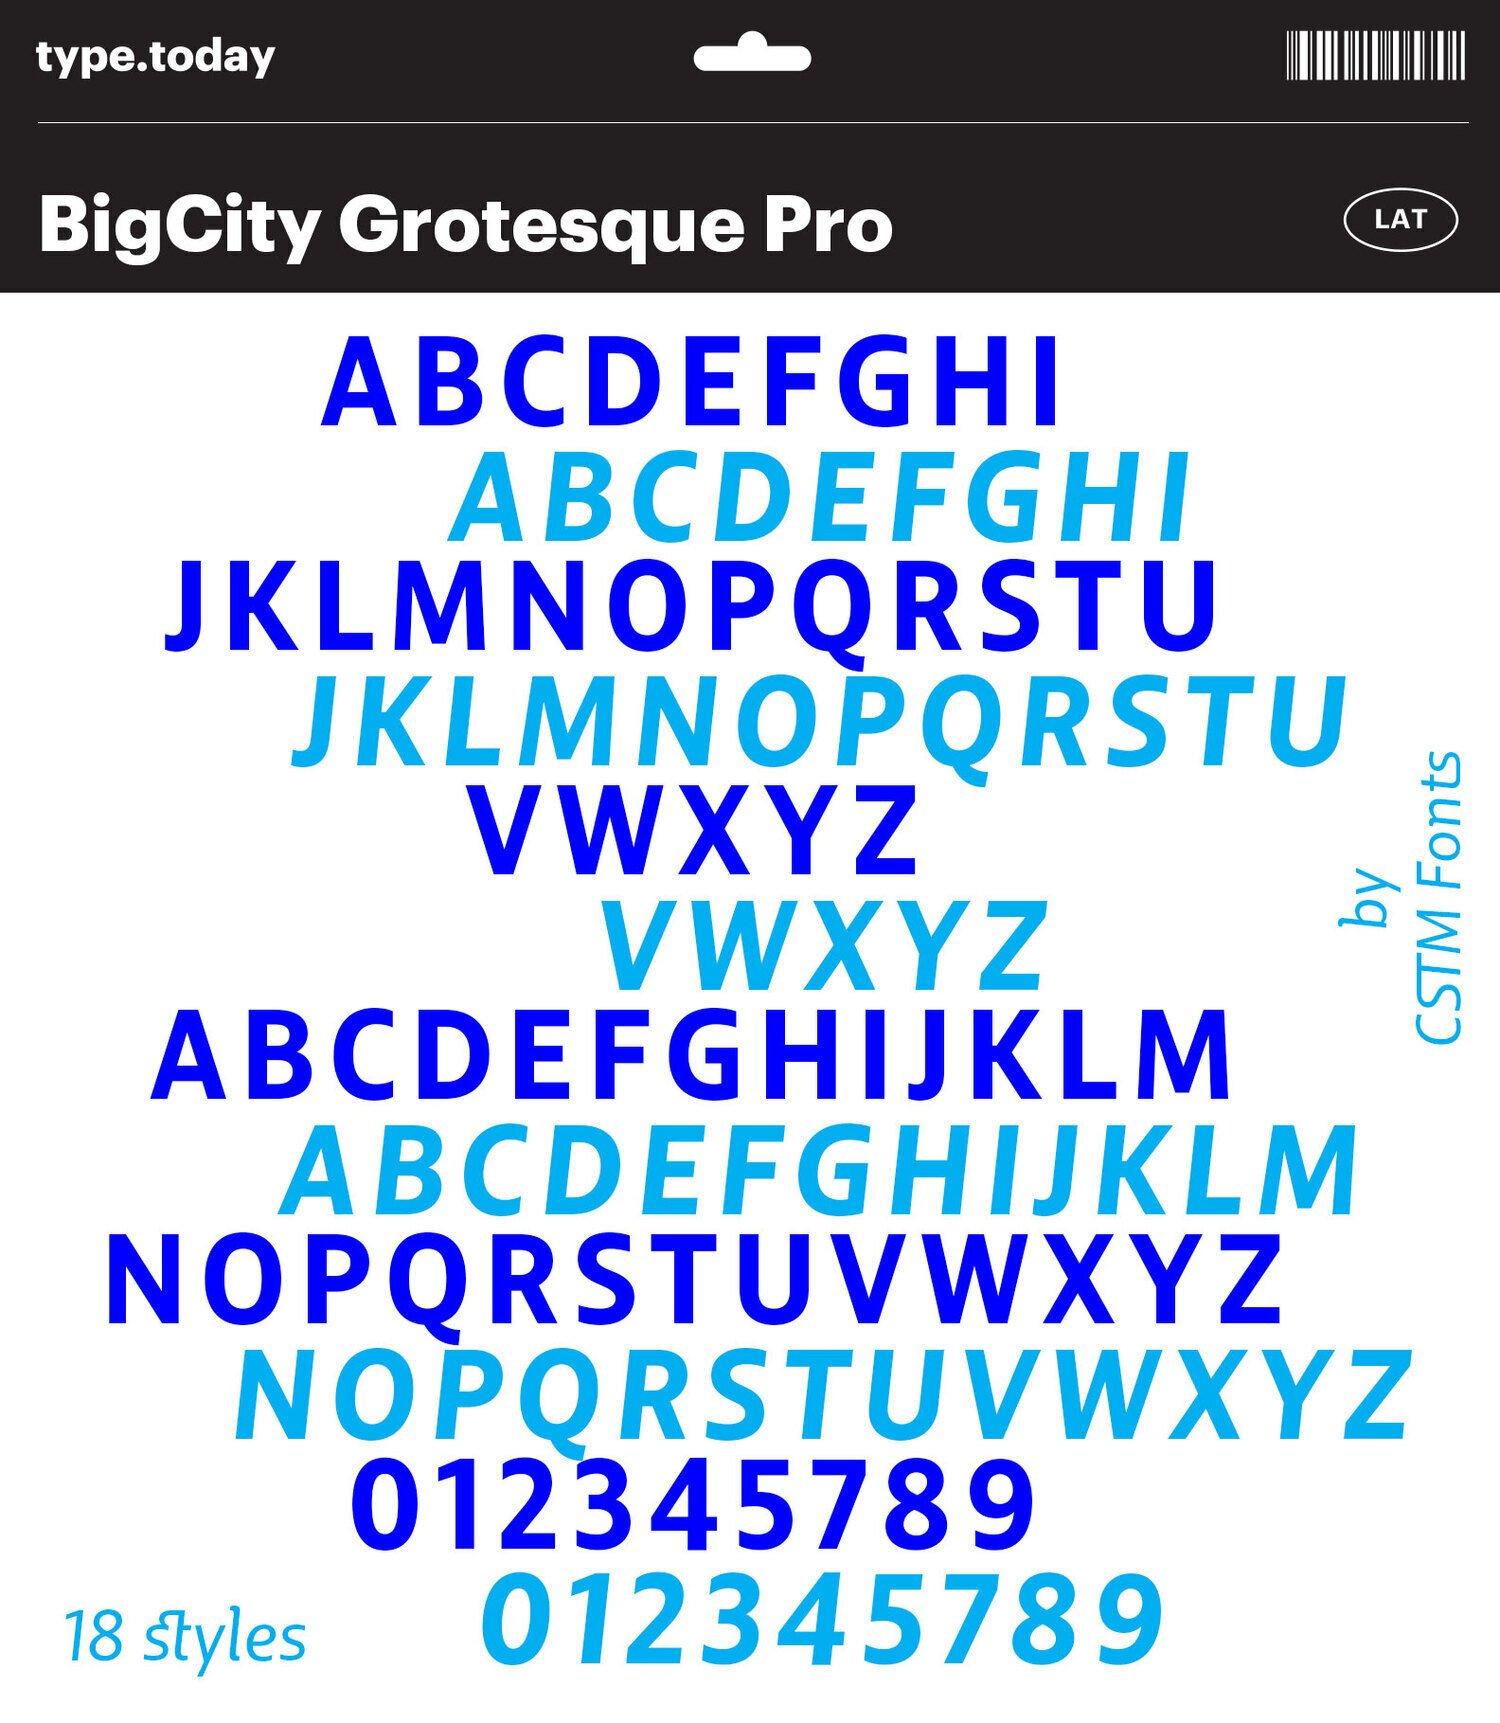 TT_BigCity_AlphabetLat